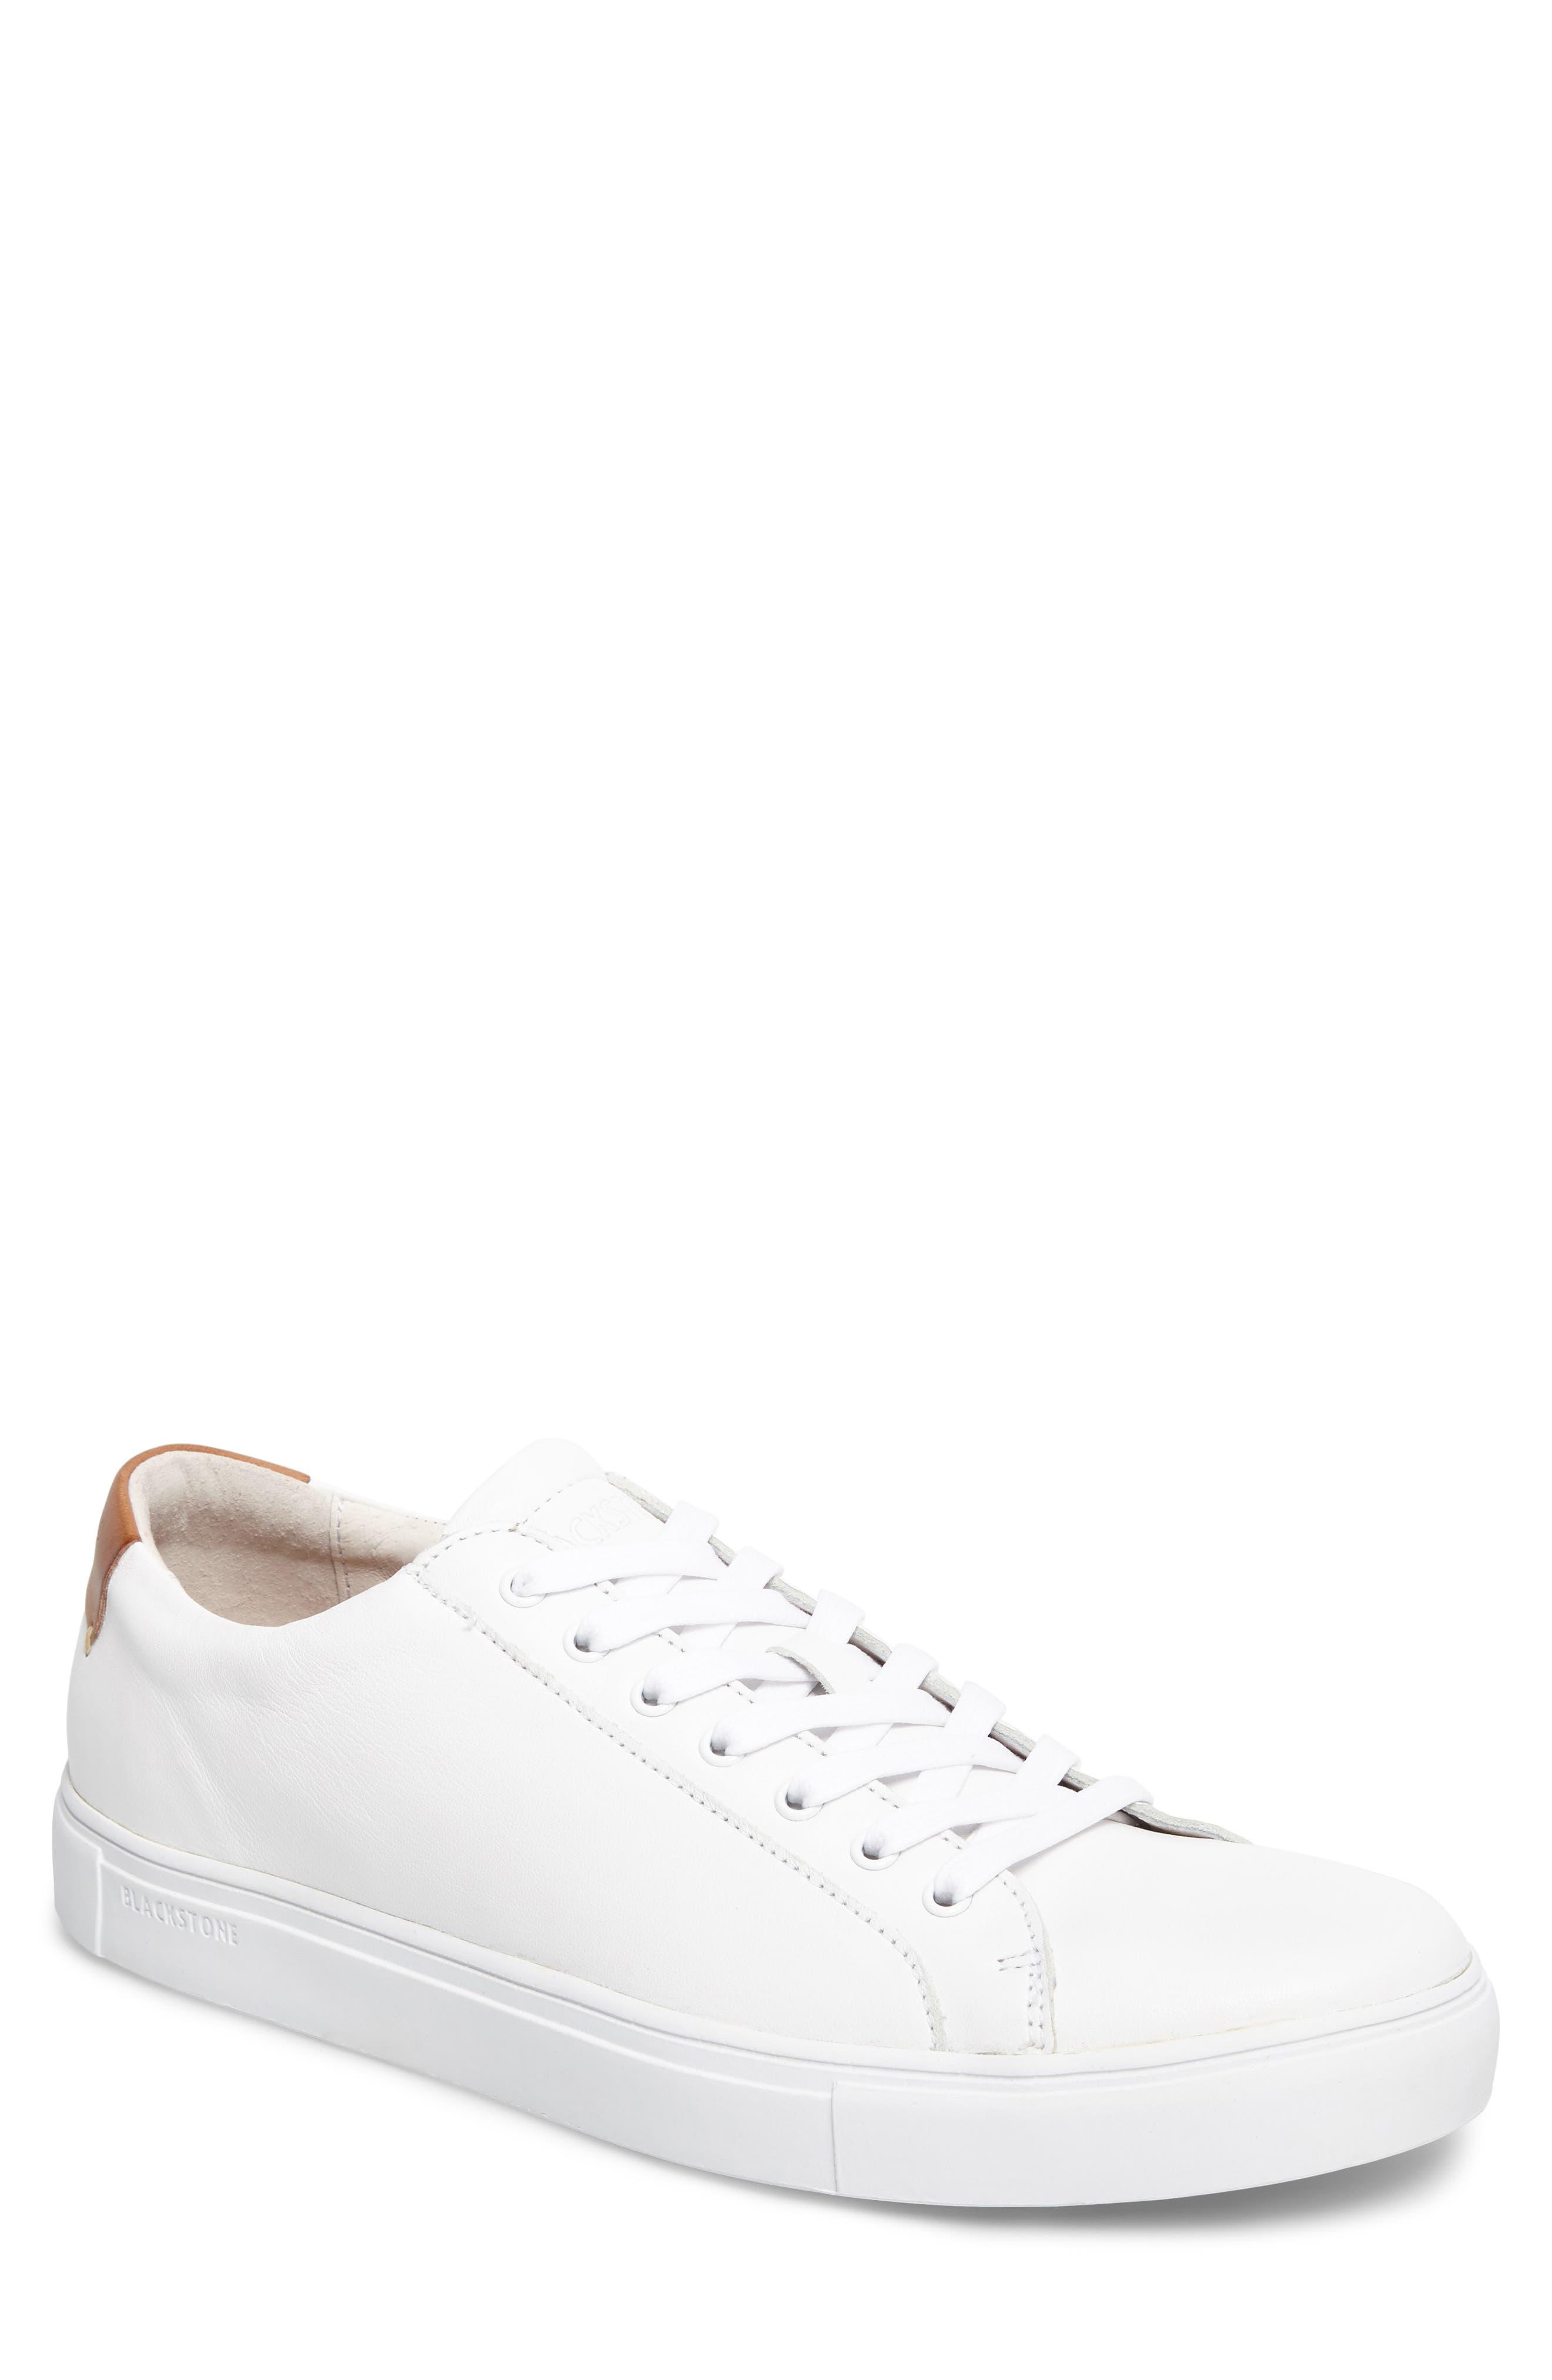 Blackstone NM01 7 Eyelet Sneaker (Men)